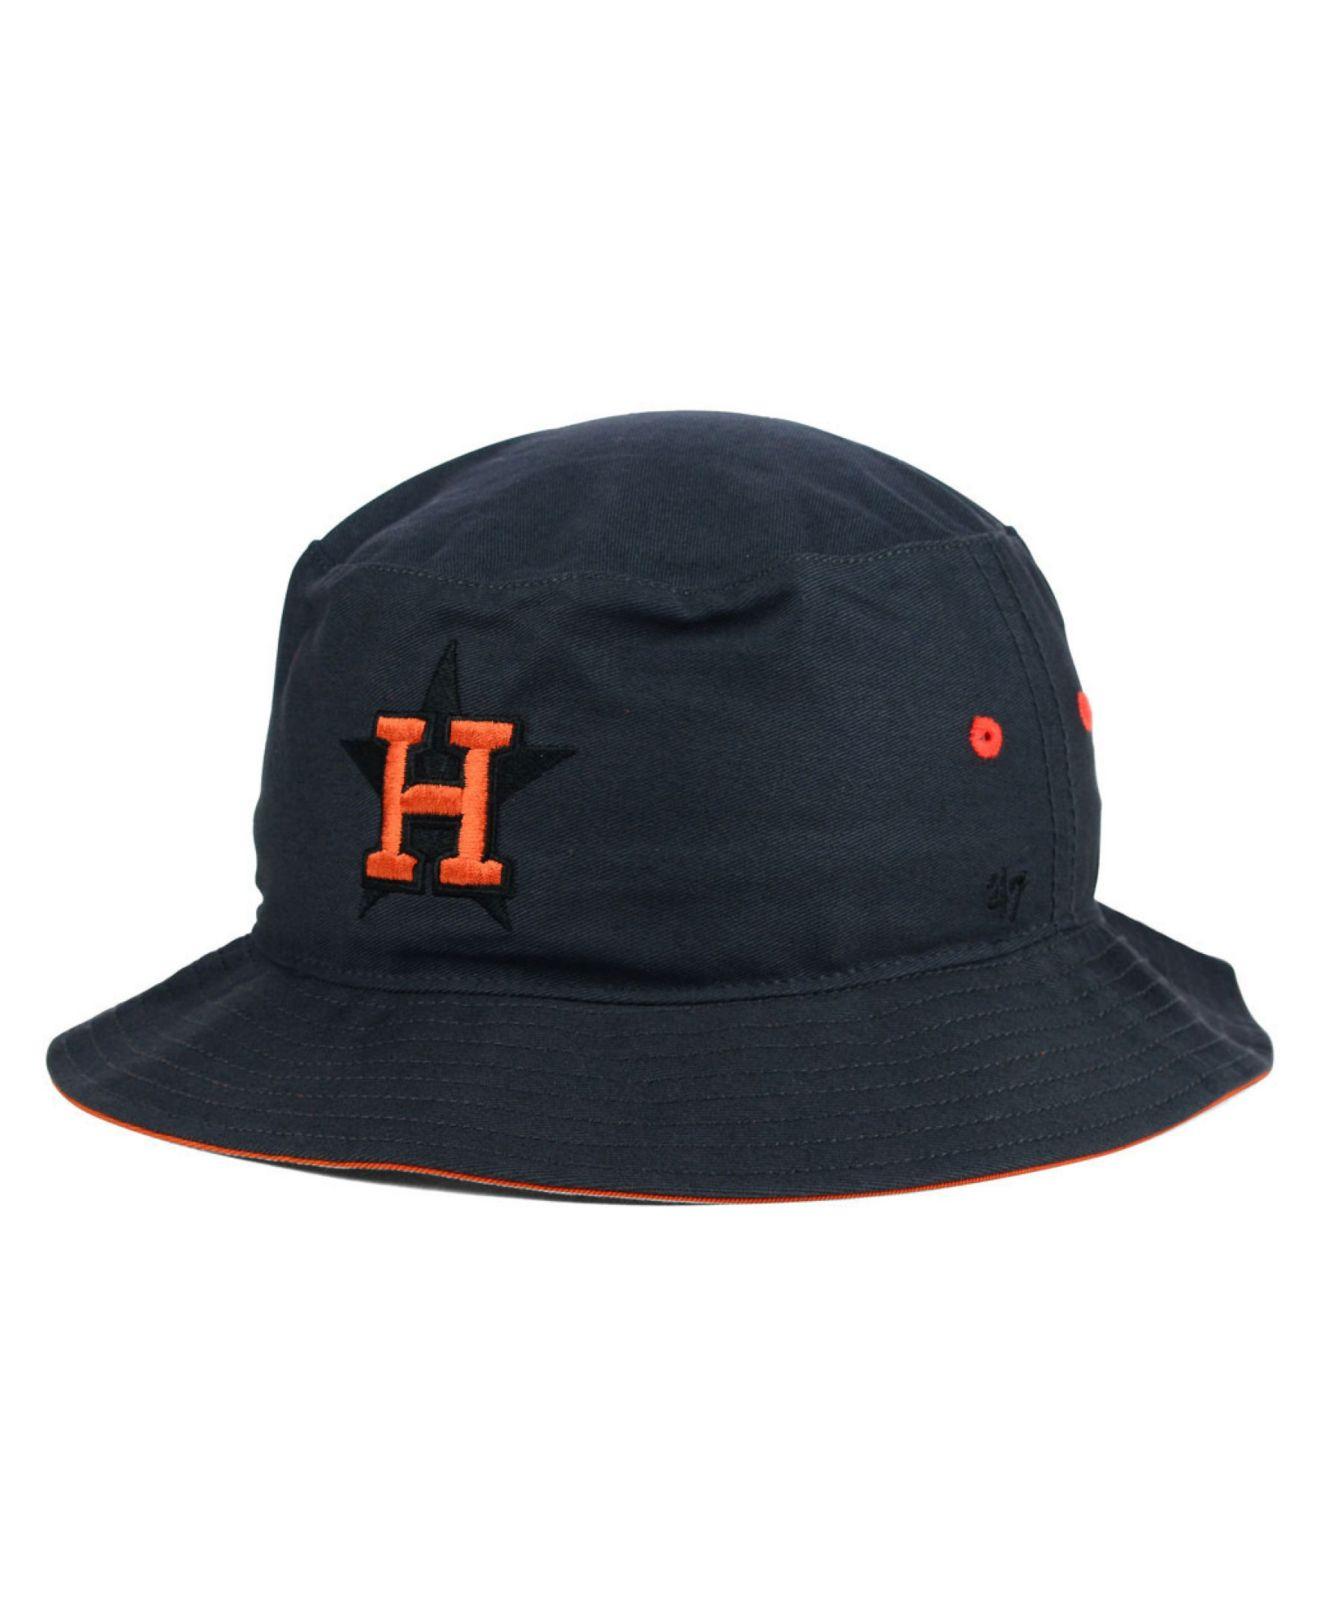 0cbd61d7dbc Lyst - 47 Brand Houston Astros Turbo Bucket Hat in Gray